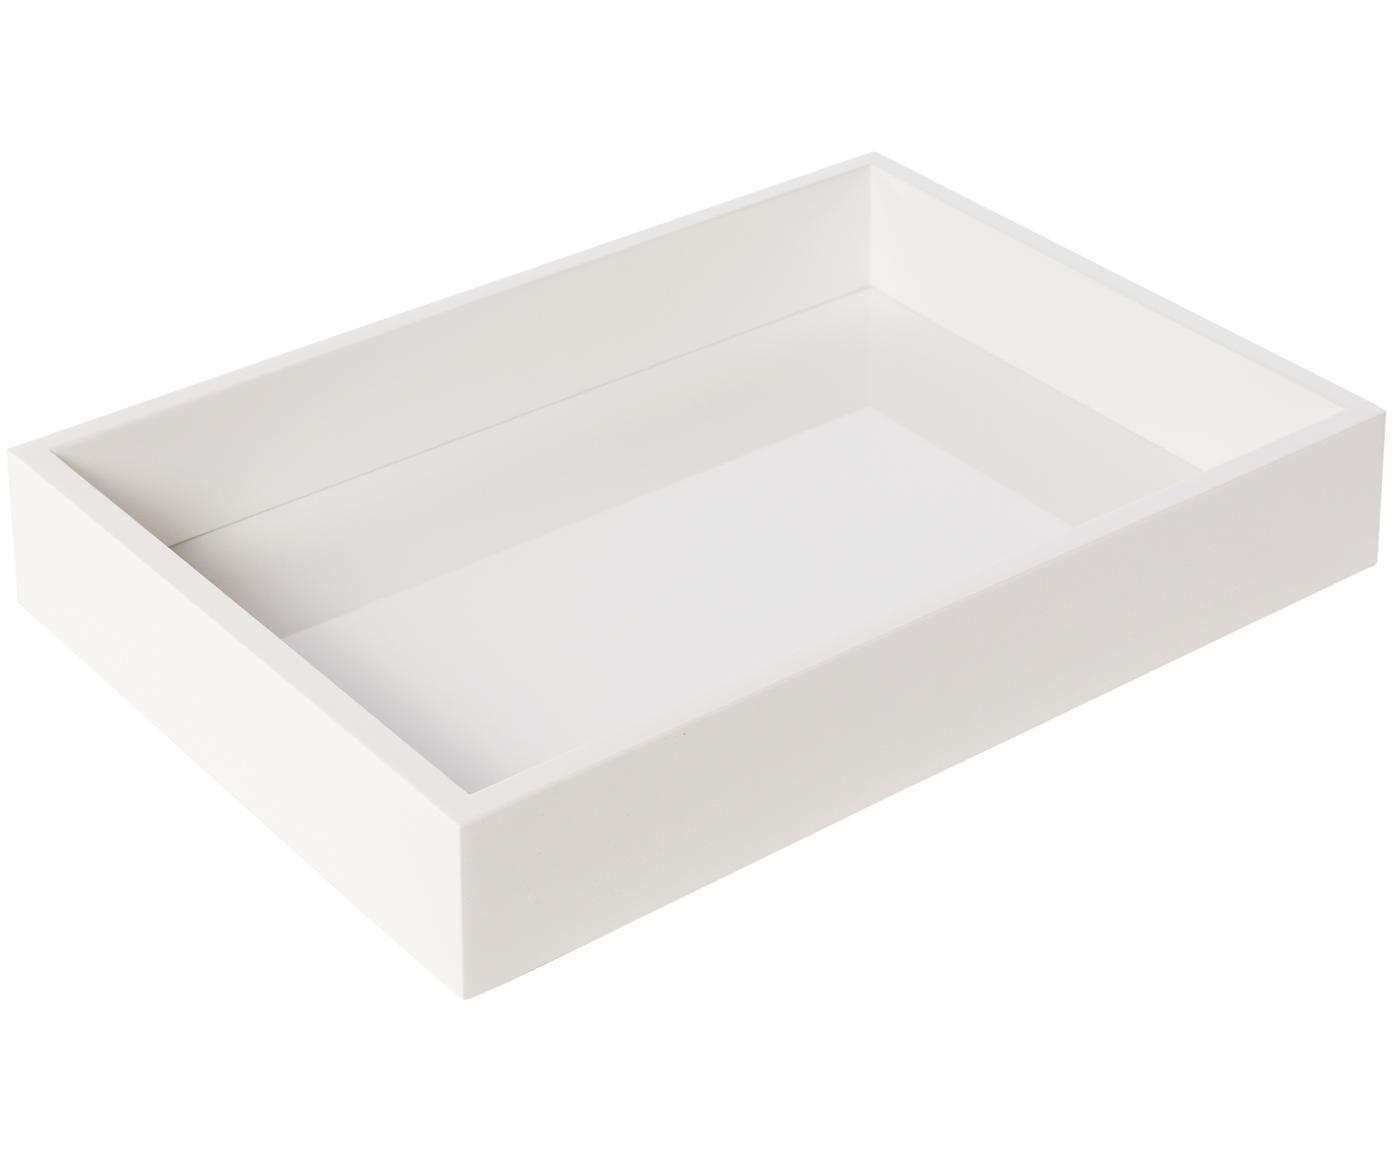 Vassoio bianco lucido Tracy, Vassoio: pannello di fibra a media, Bianco, Larg. 33 x Prof. 24 cm